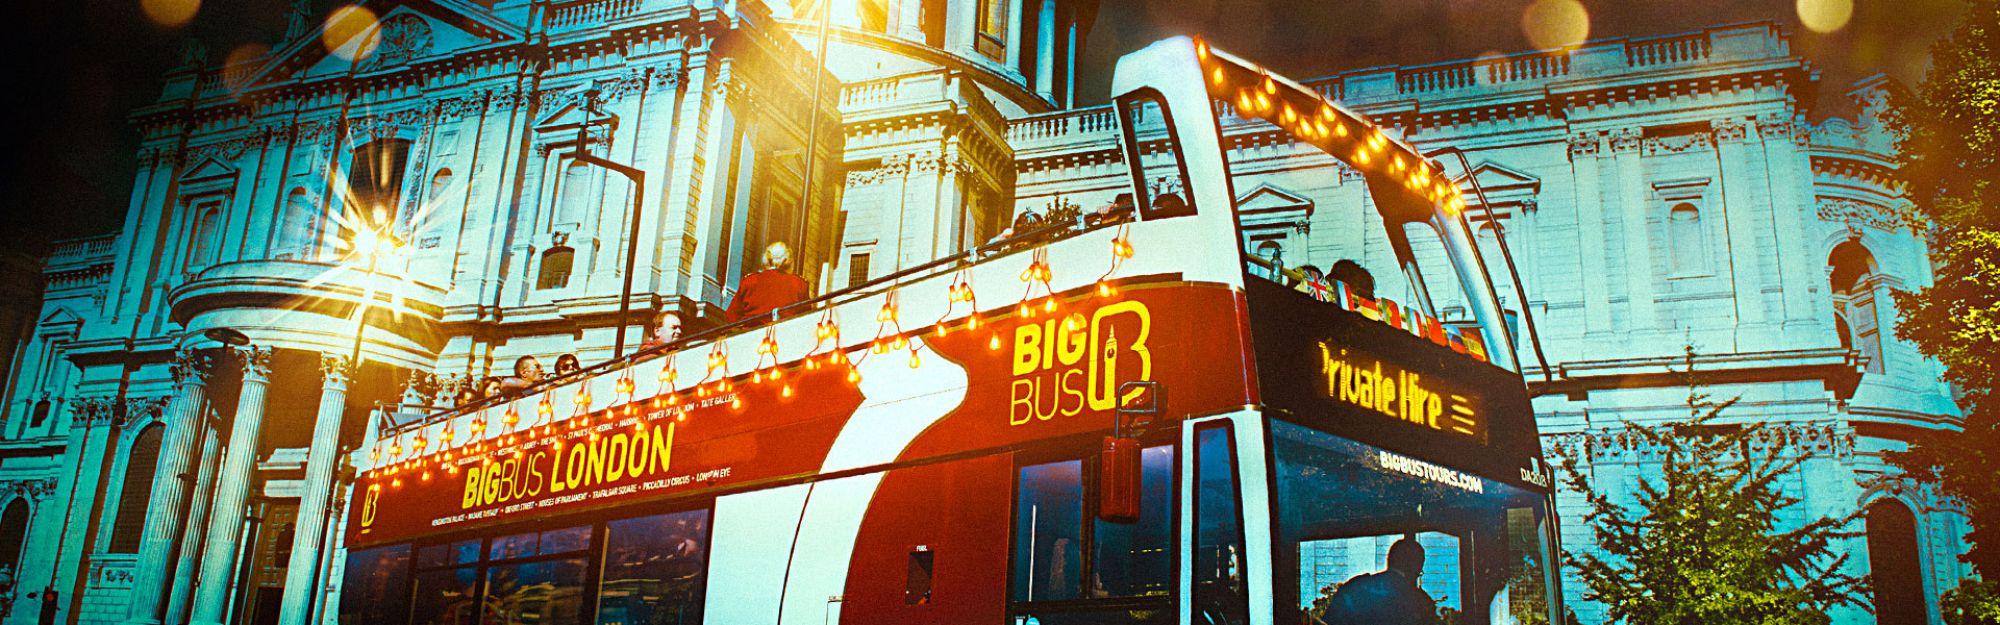 London London Night Tour